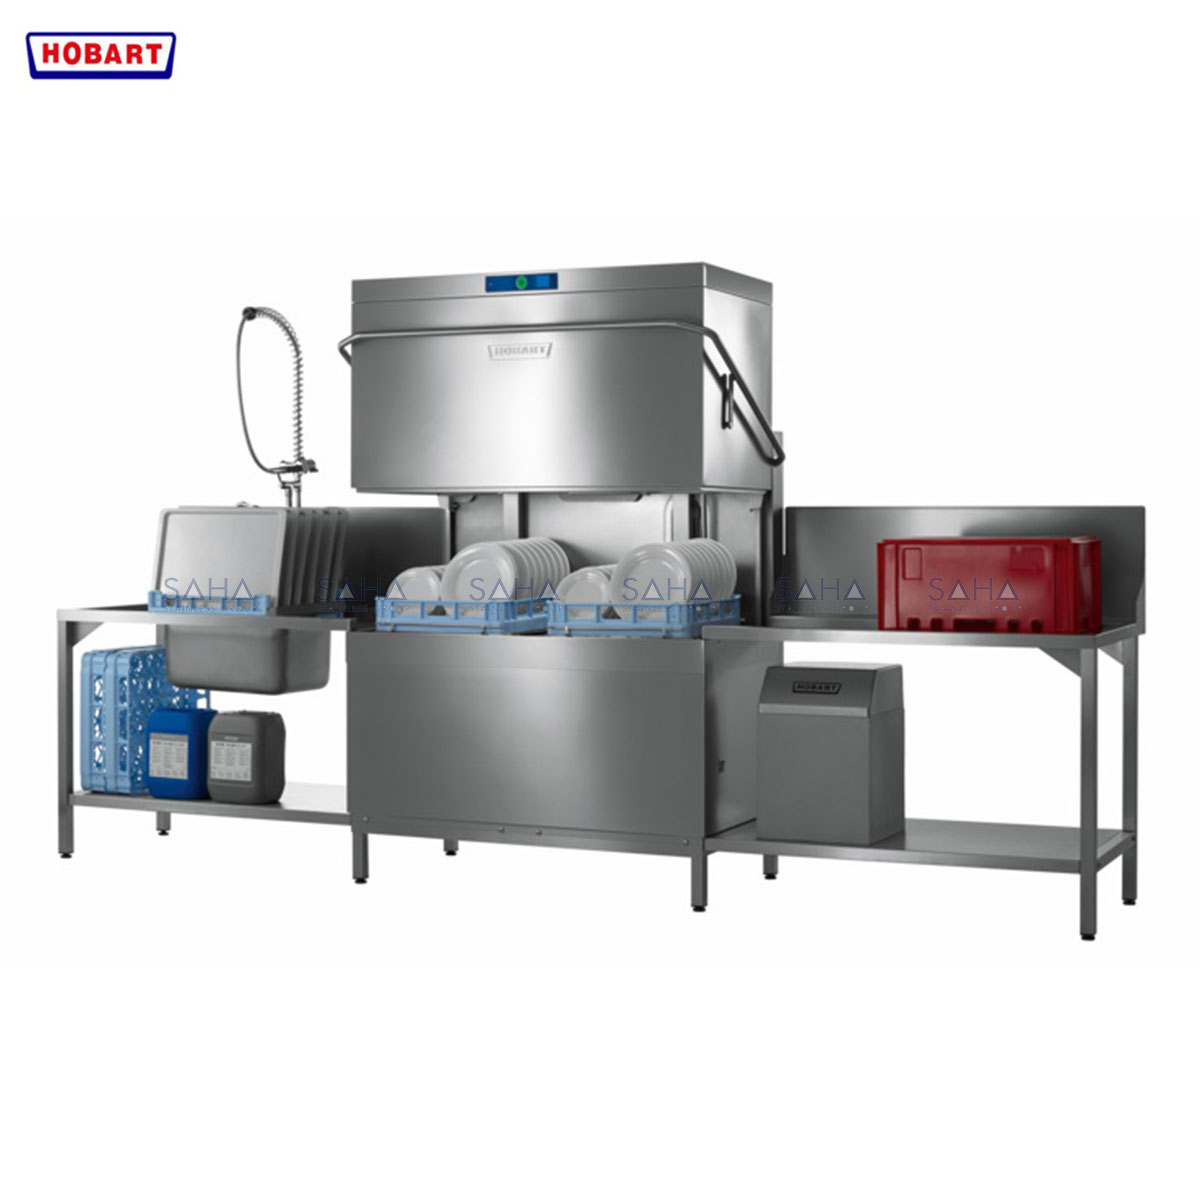 Hobart - Dishwasher - PROFI AMXT